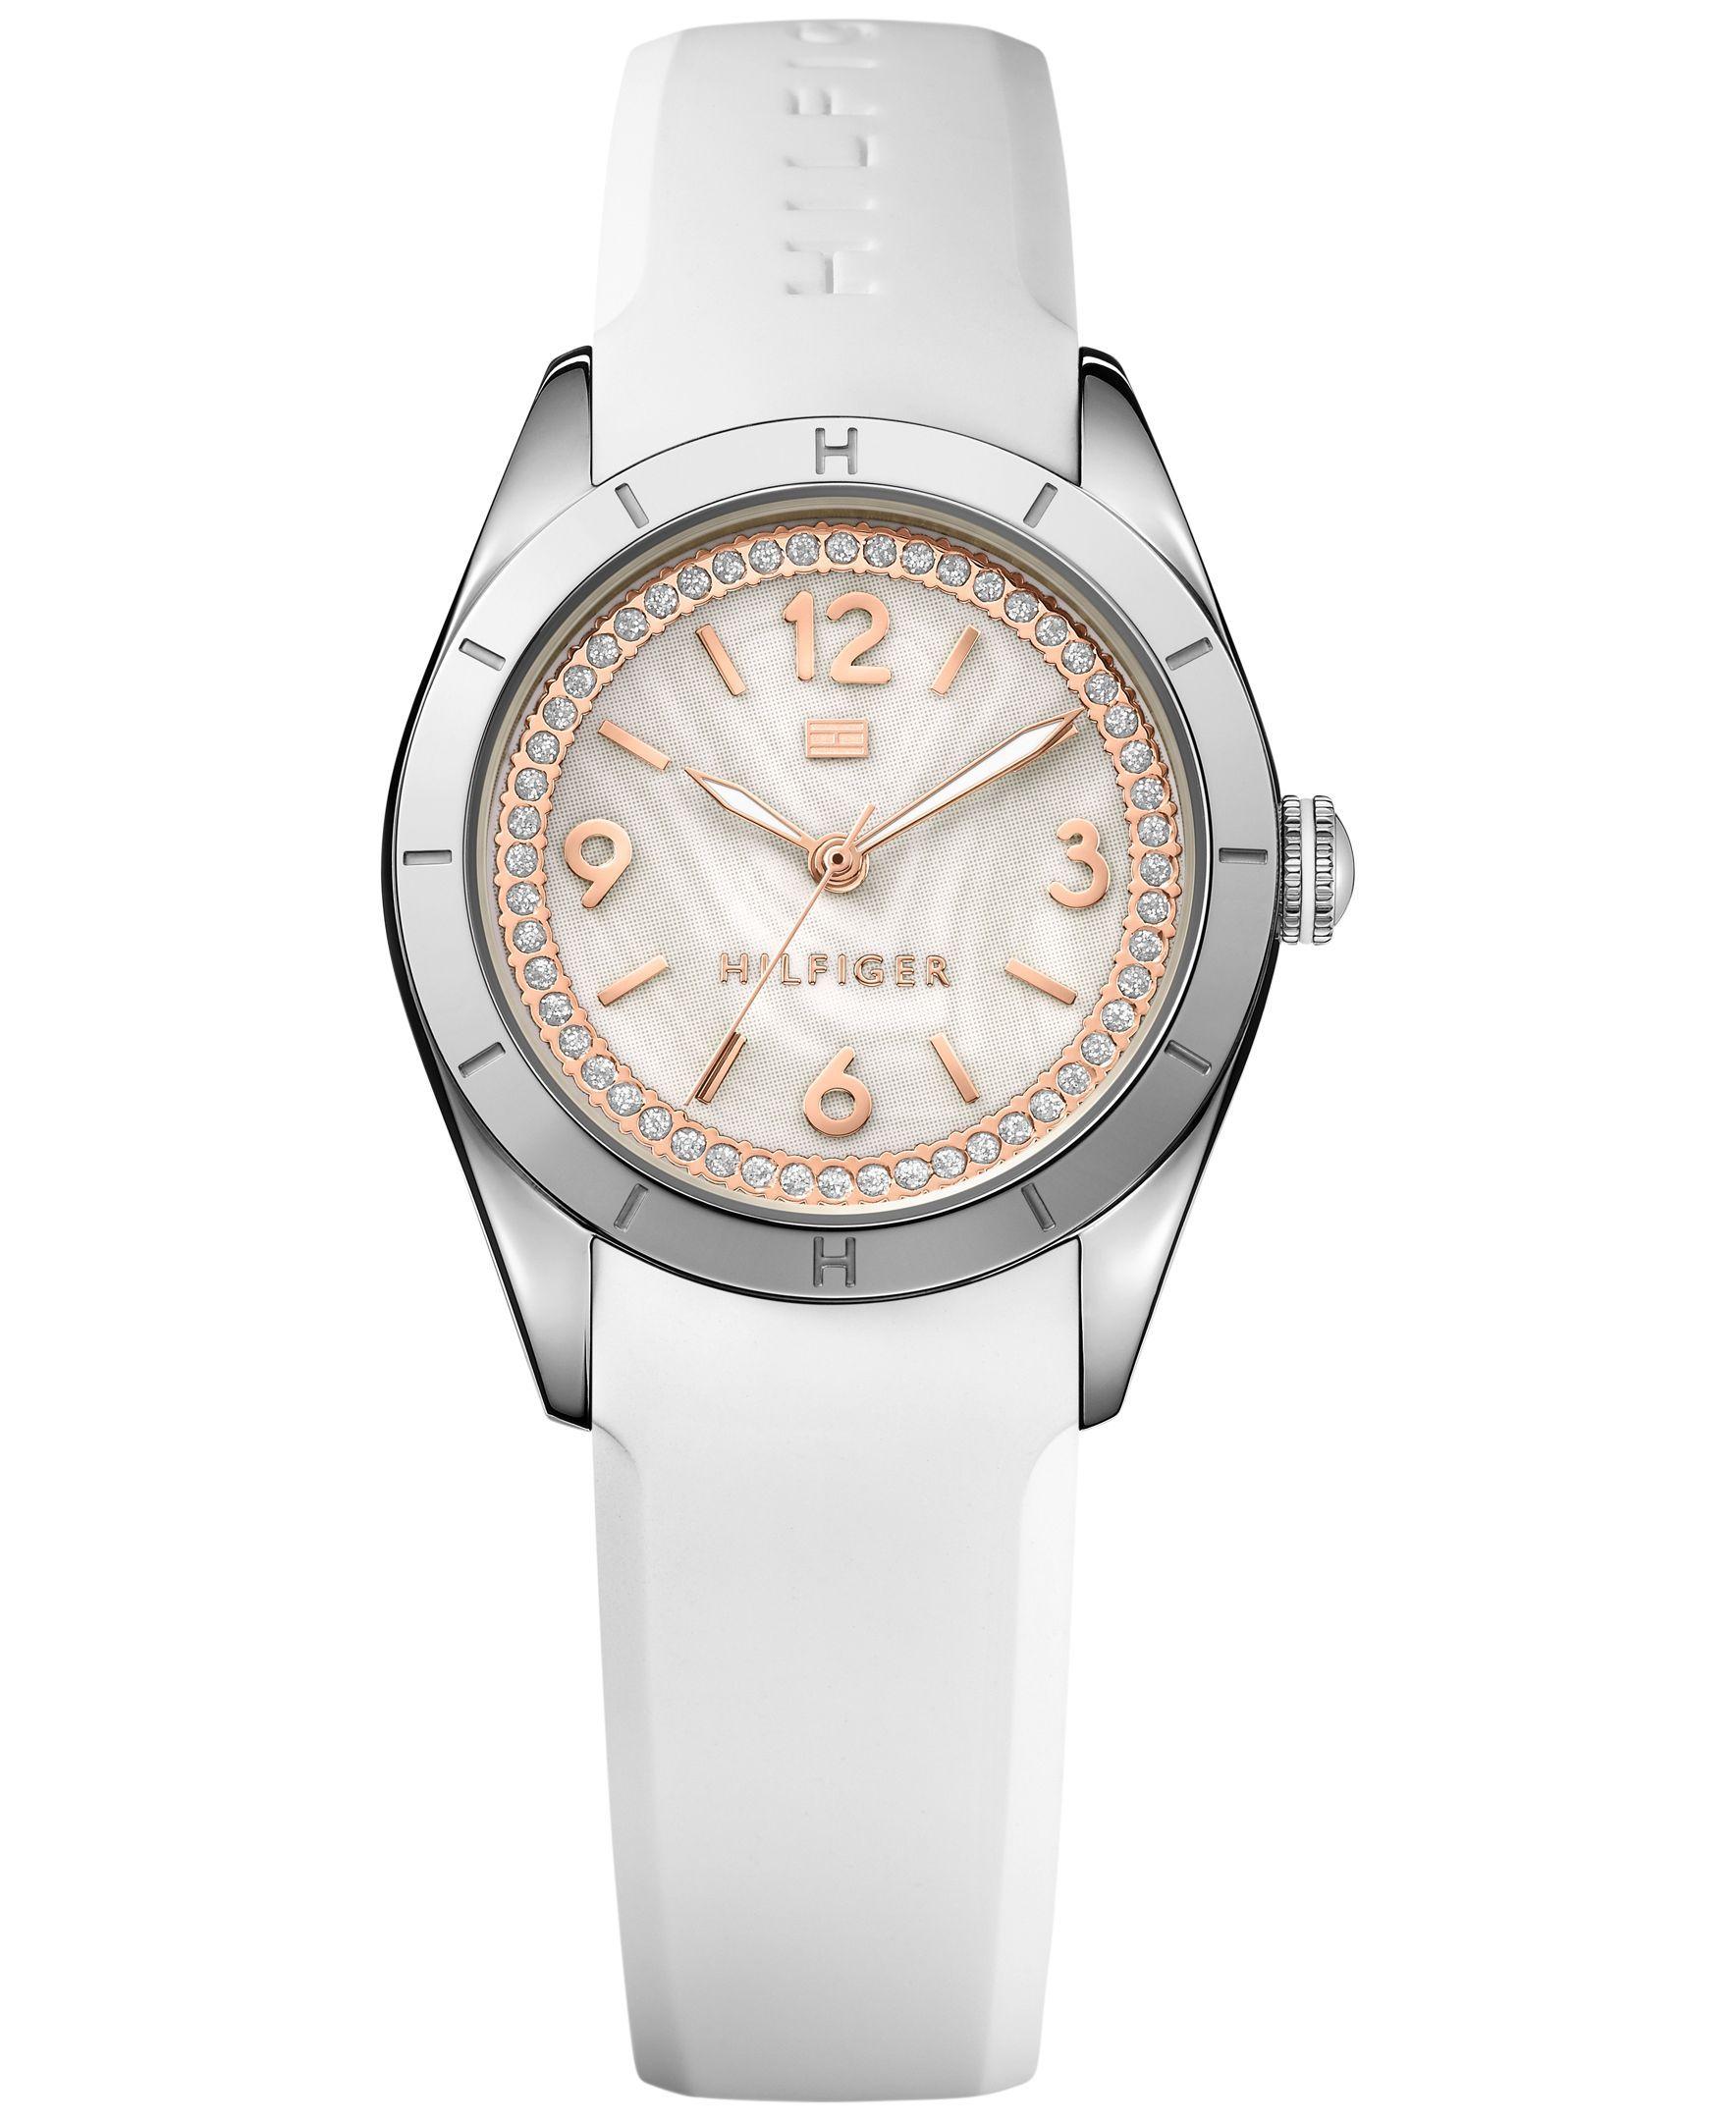 Tommy Hilfiger Women's White Silicone Strap Watch 30mm